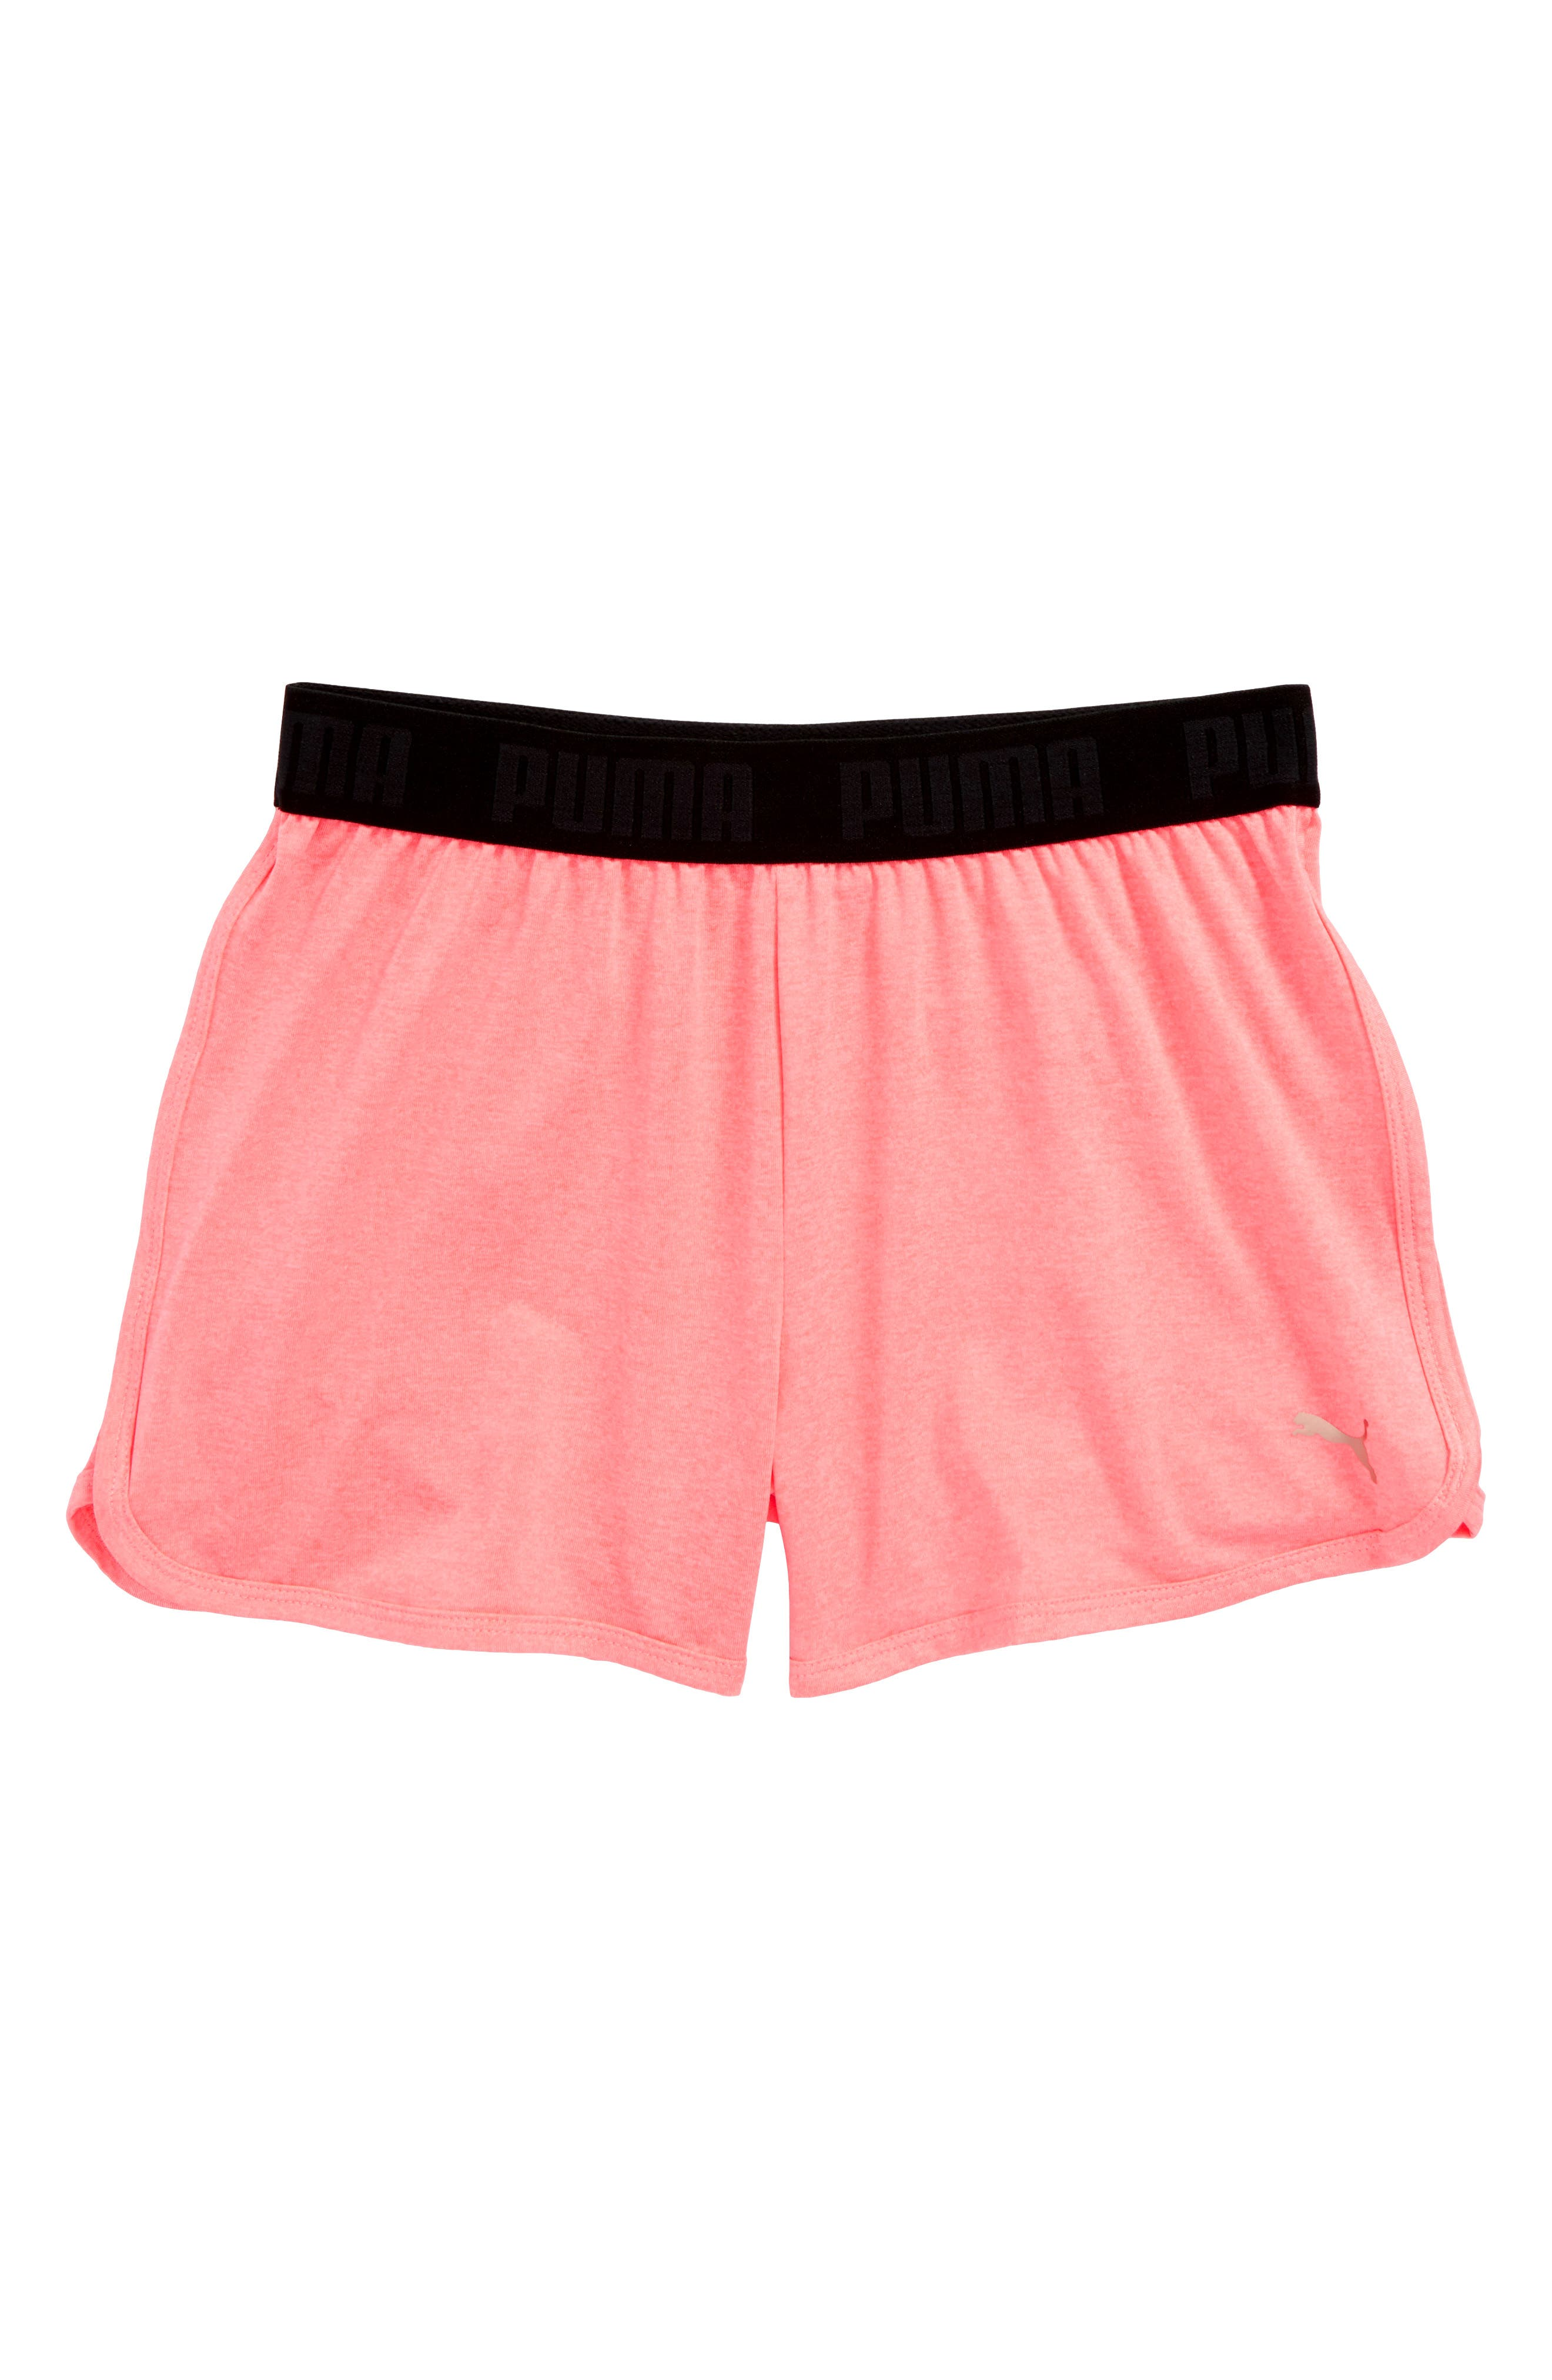 Logo Sport Shorts,                         Main,                         color, Soft Flu Peach Heather